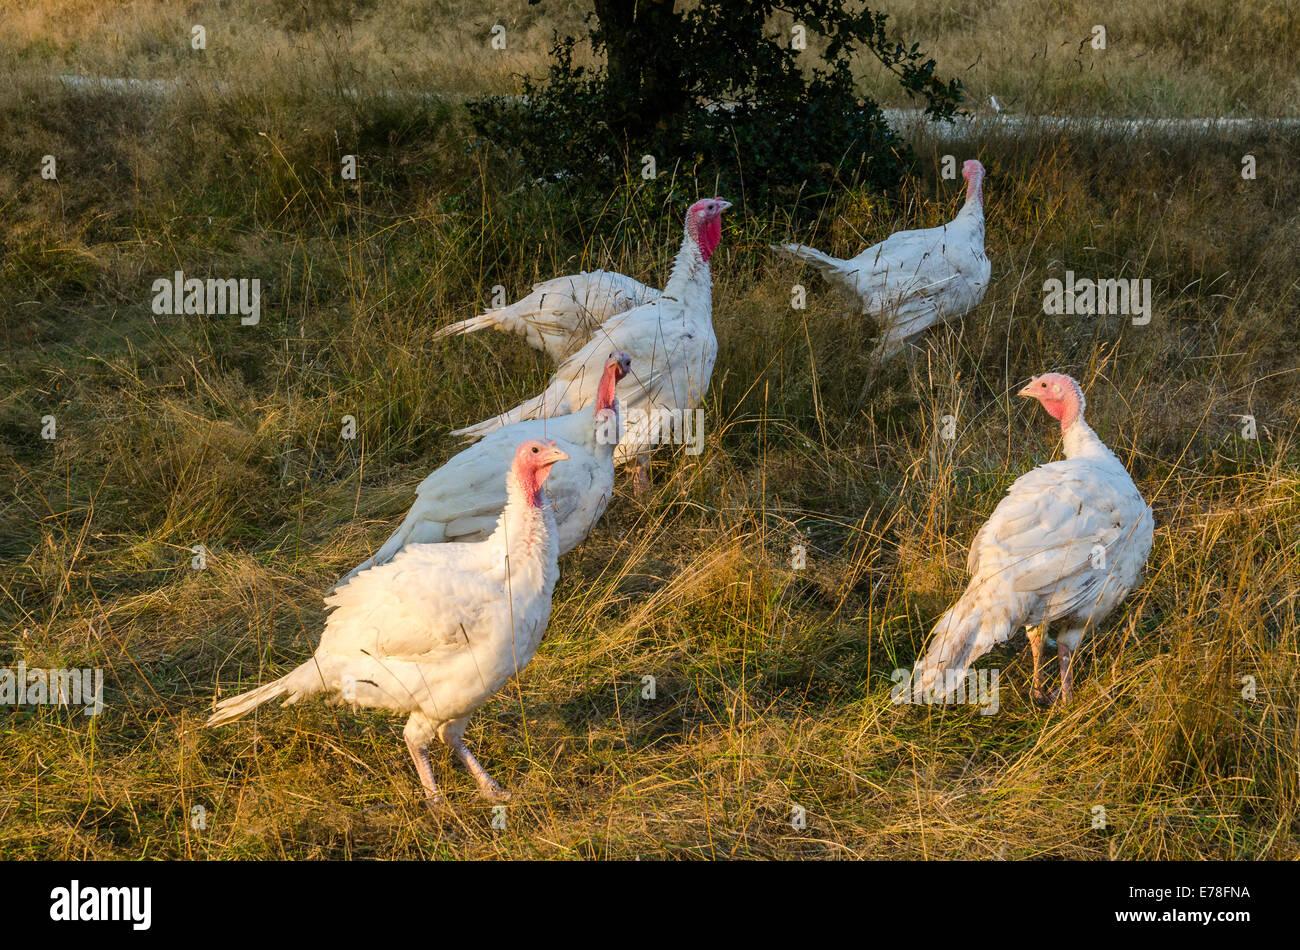 Turkeys, the Ruckle Farm, Ruckle Provincial Park, Salt spring Island, British Columbia, Canada - Stock Image